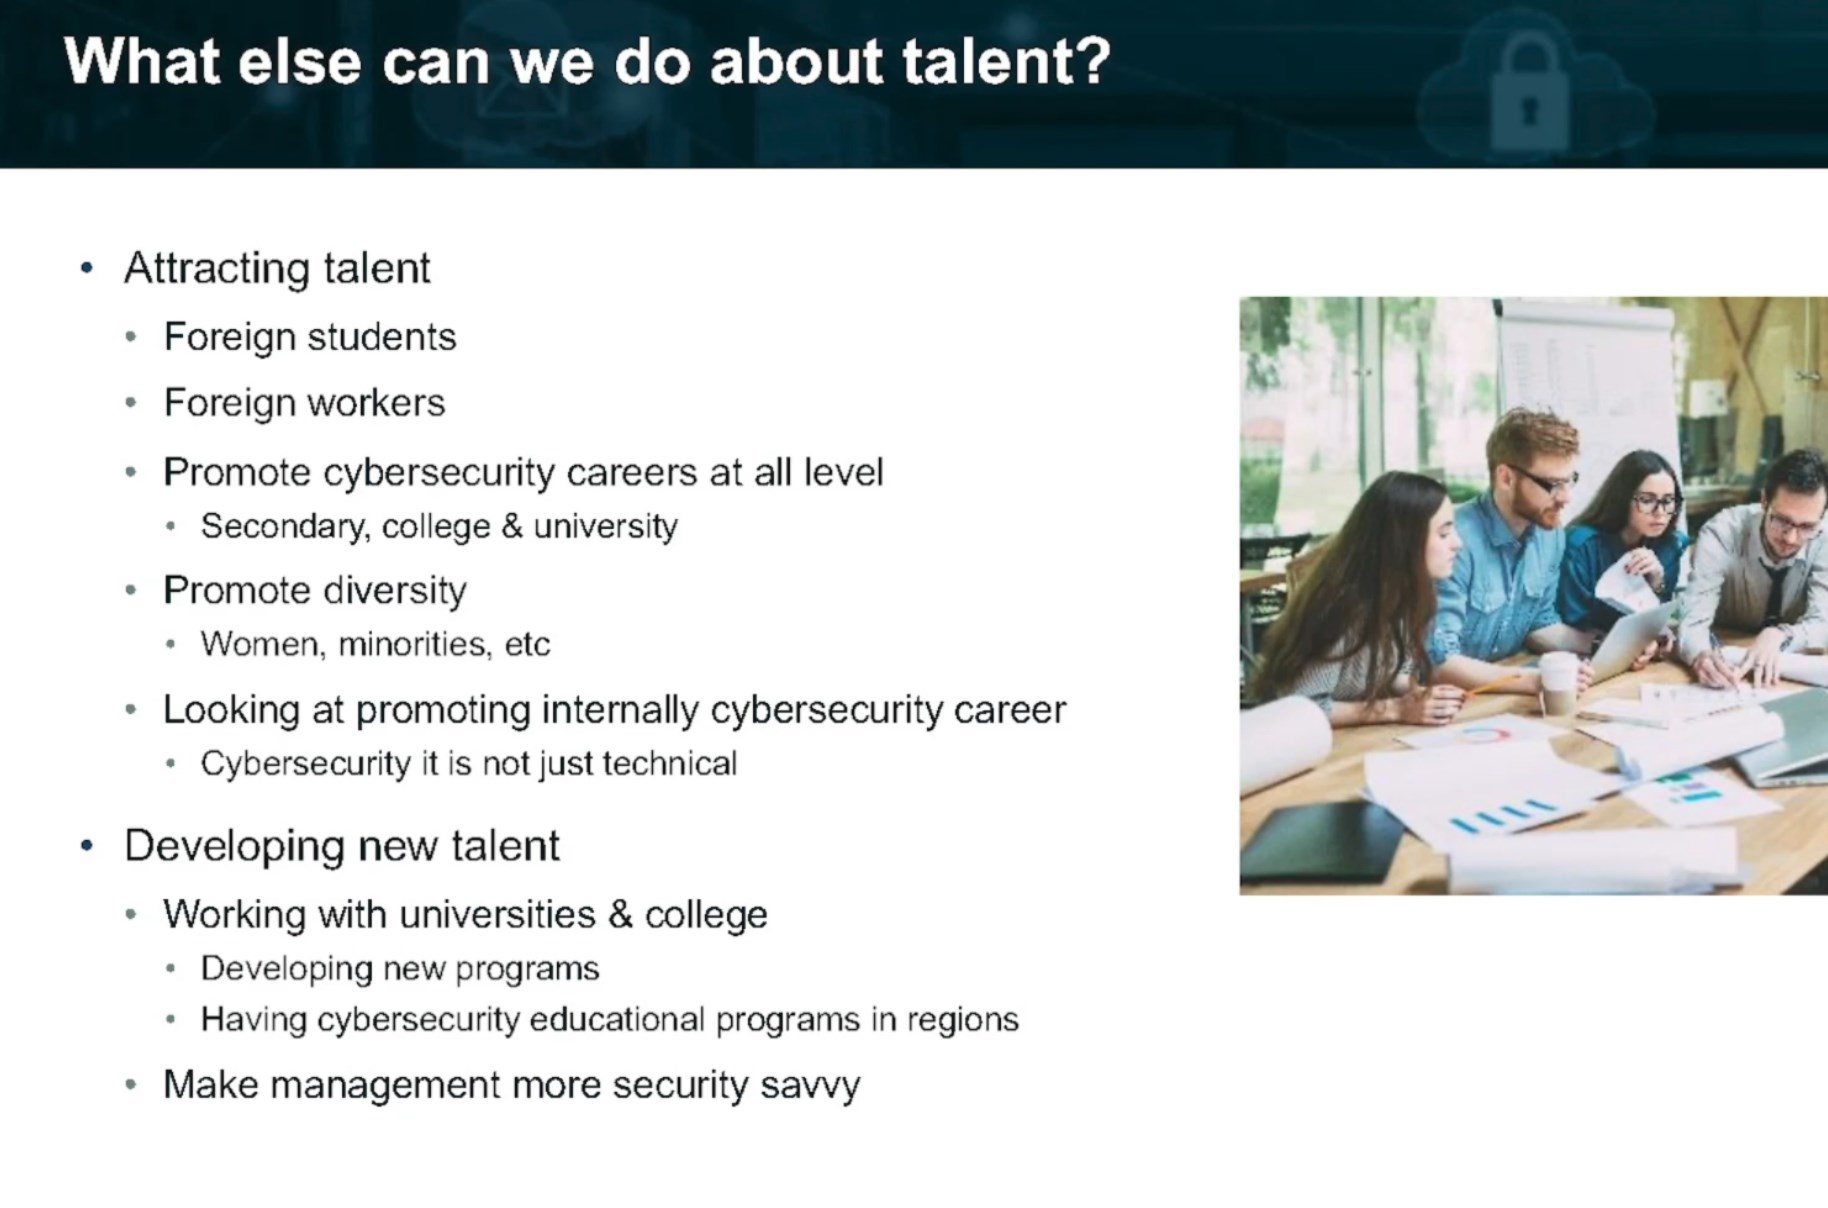 Filling the talent gap will need diversity.